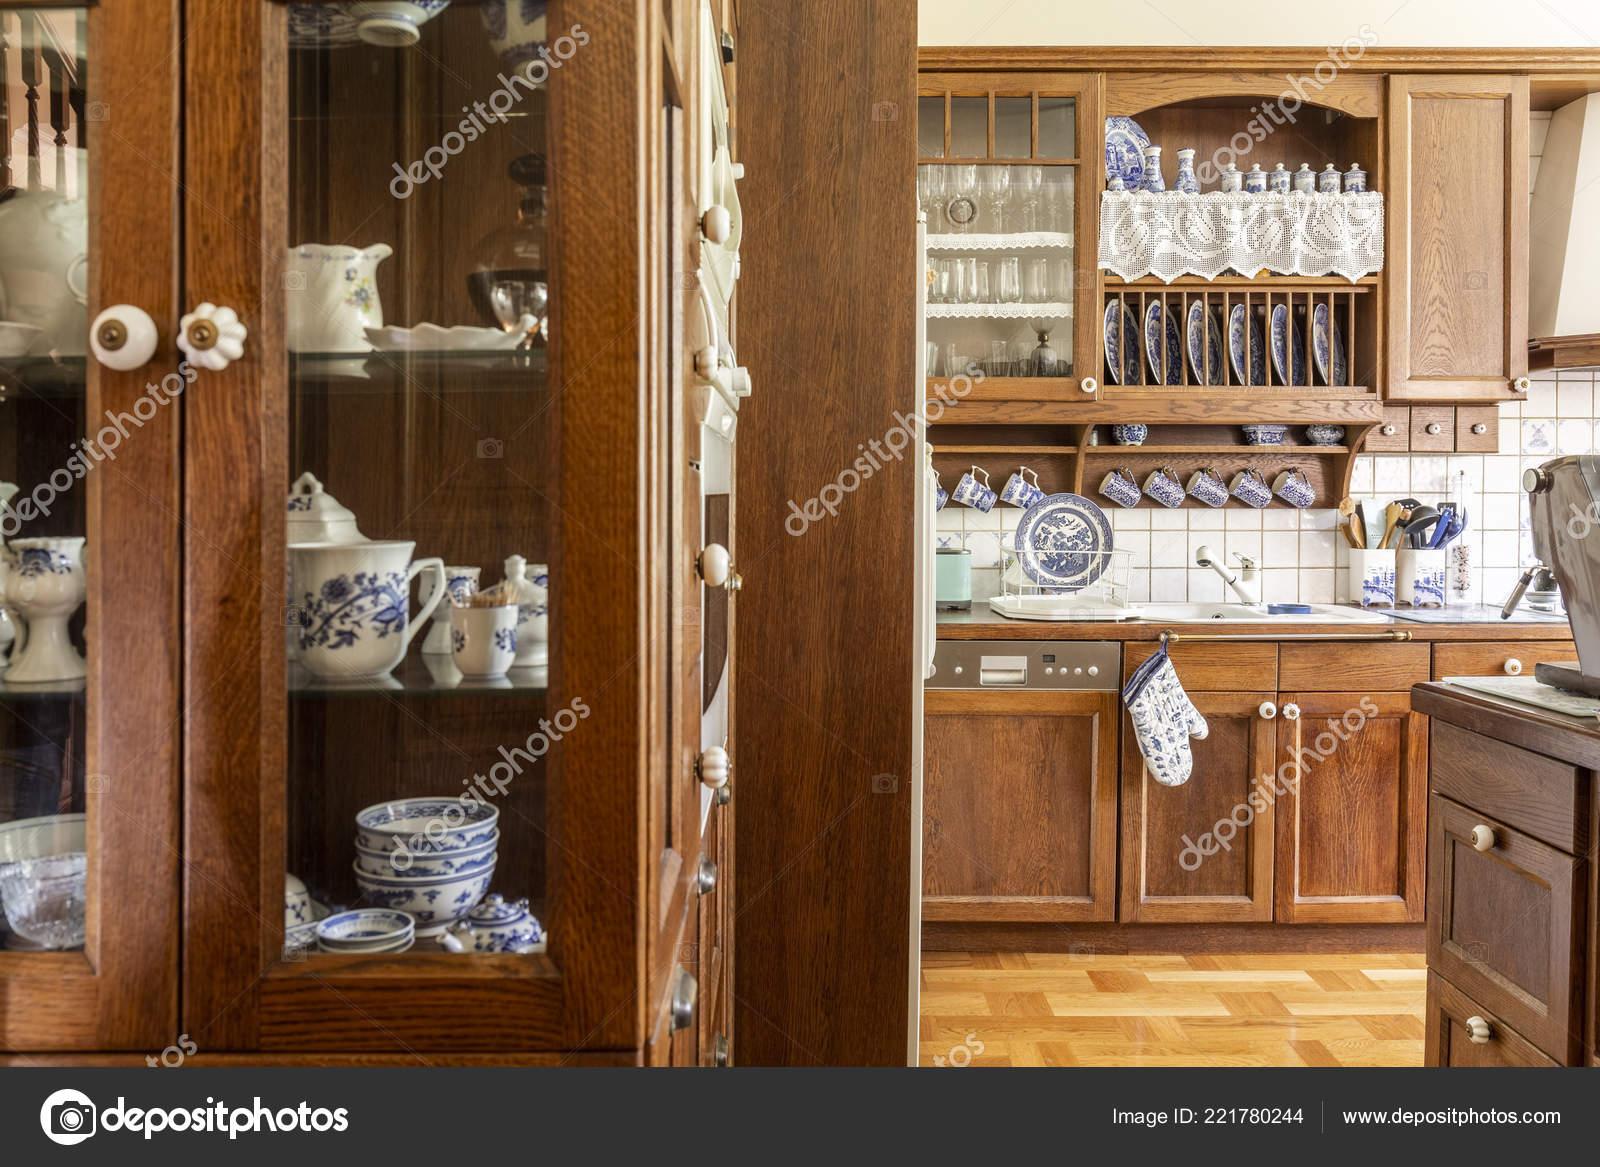 ouderwetse houten kasten met wit kobalt blauw china keuken interieur stockfoto